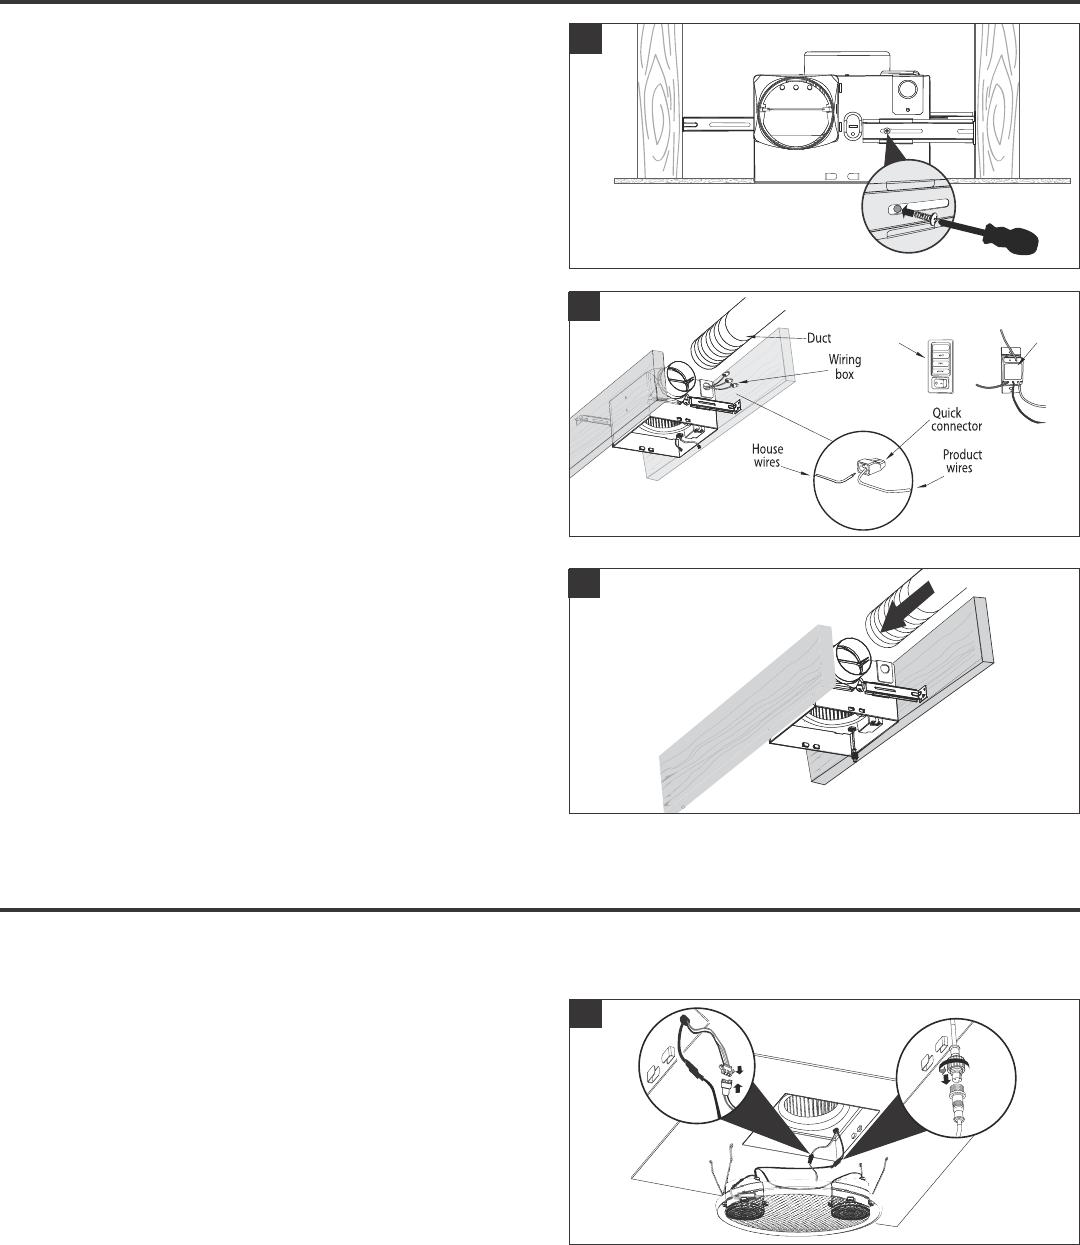 Homewerks Worldwide 7130-02-BT ventilating bath fan with ... on